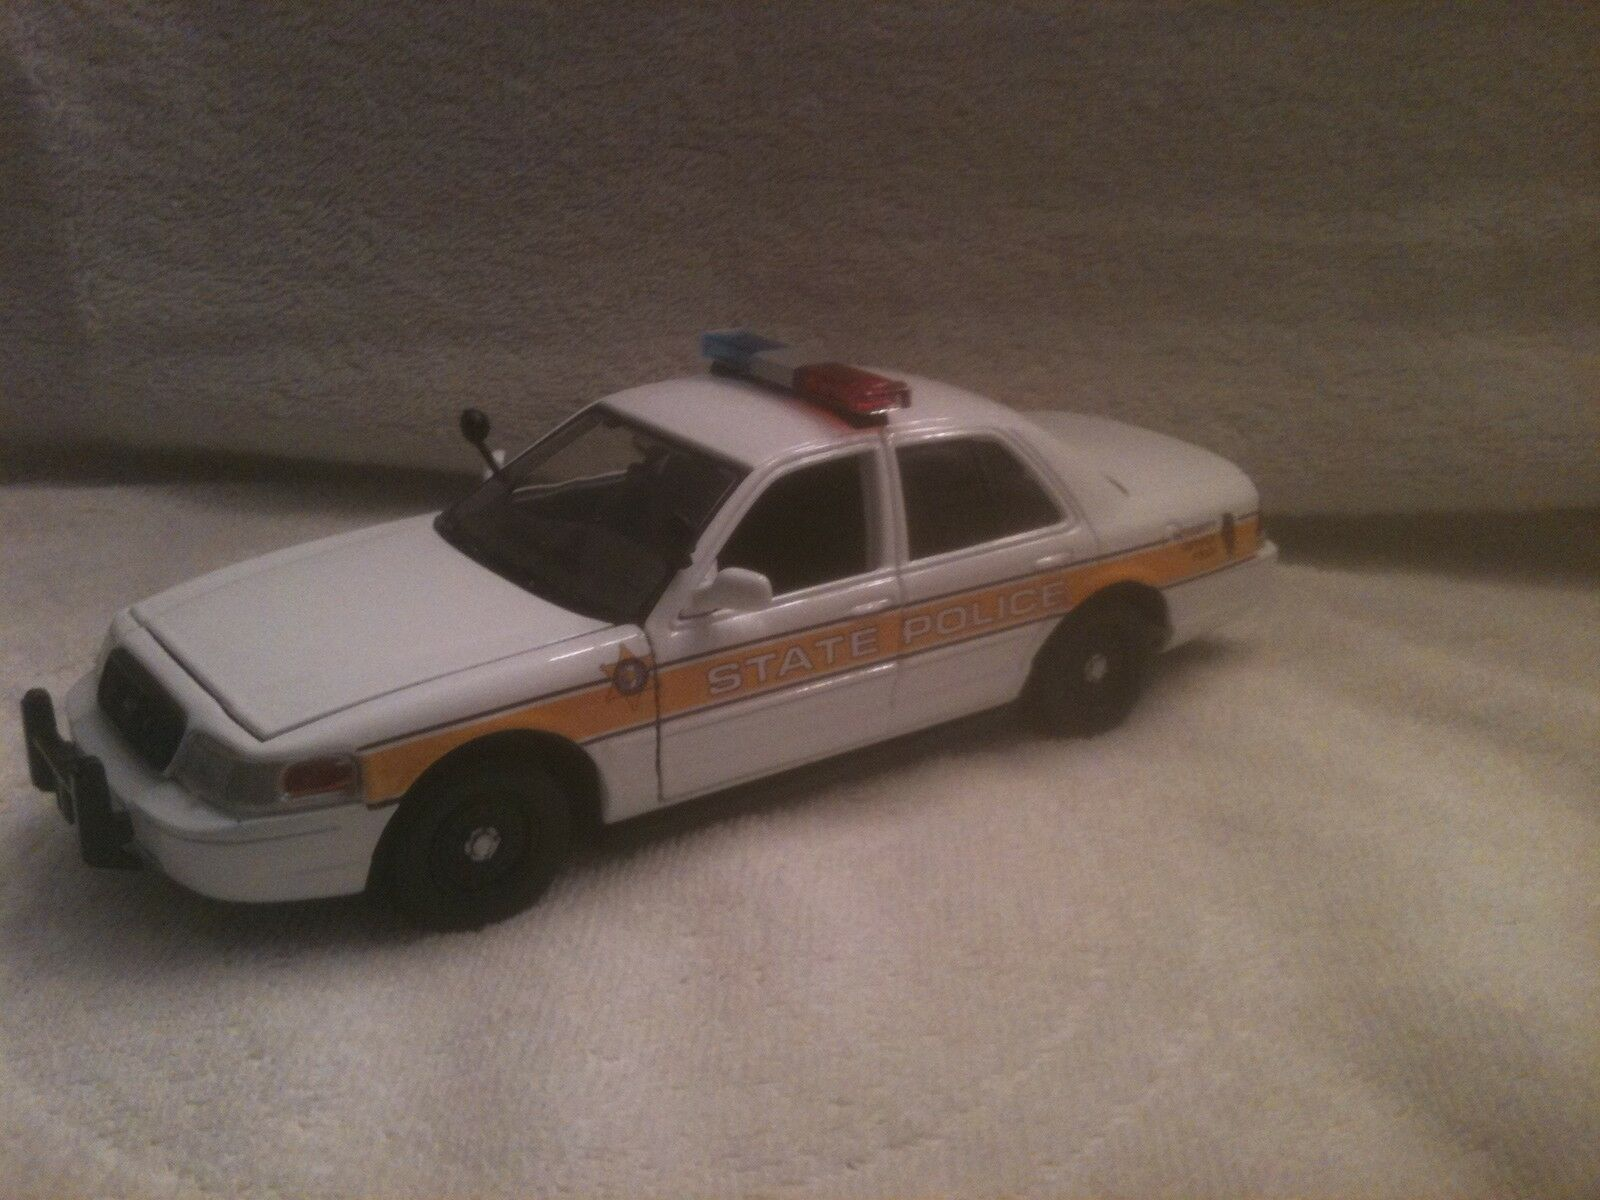 Estado de Illinois policía coche modelo diecast escala 1/24 con luces de trabajo/Sirena